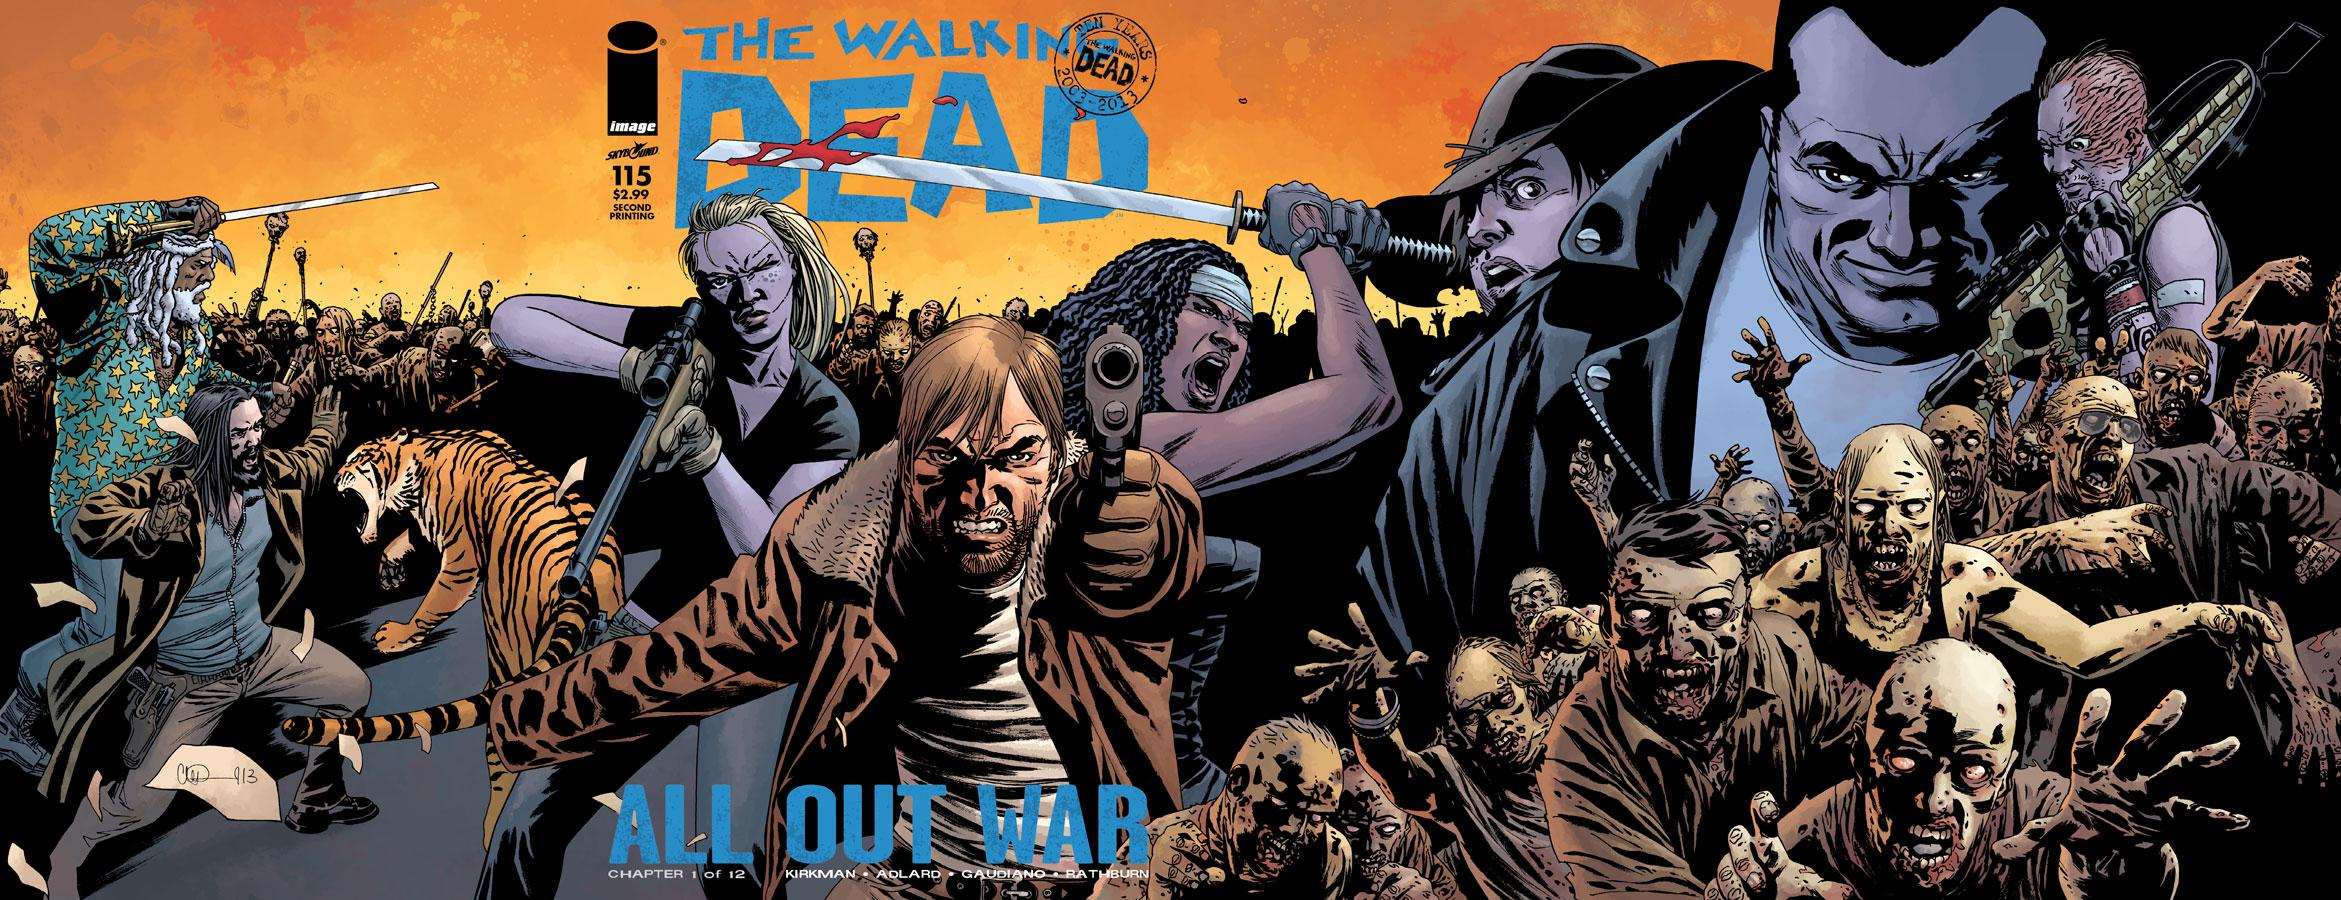 The Walking Dead Season 8 Starts Filming Today Lipstick Alley